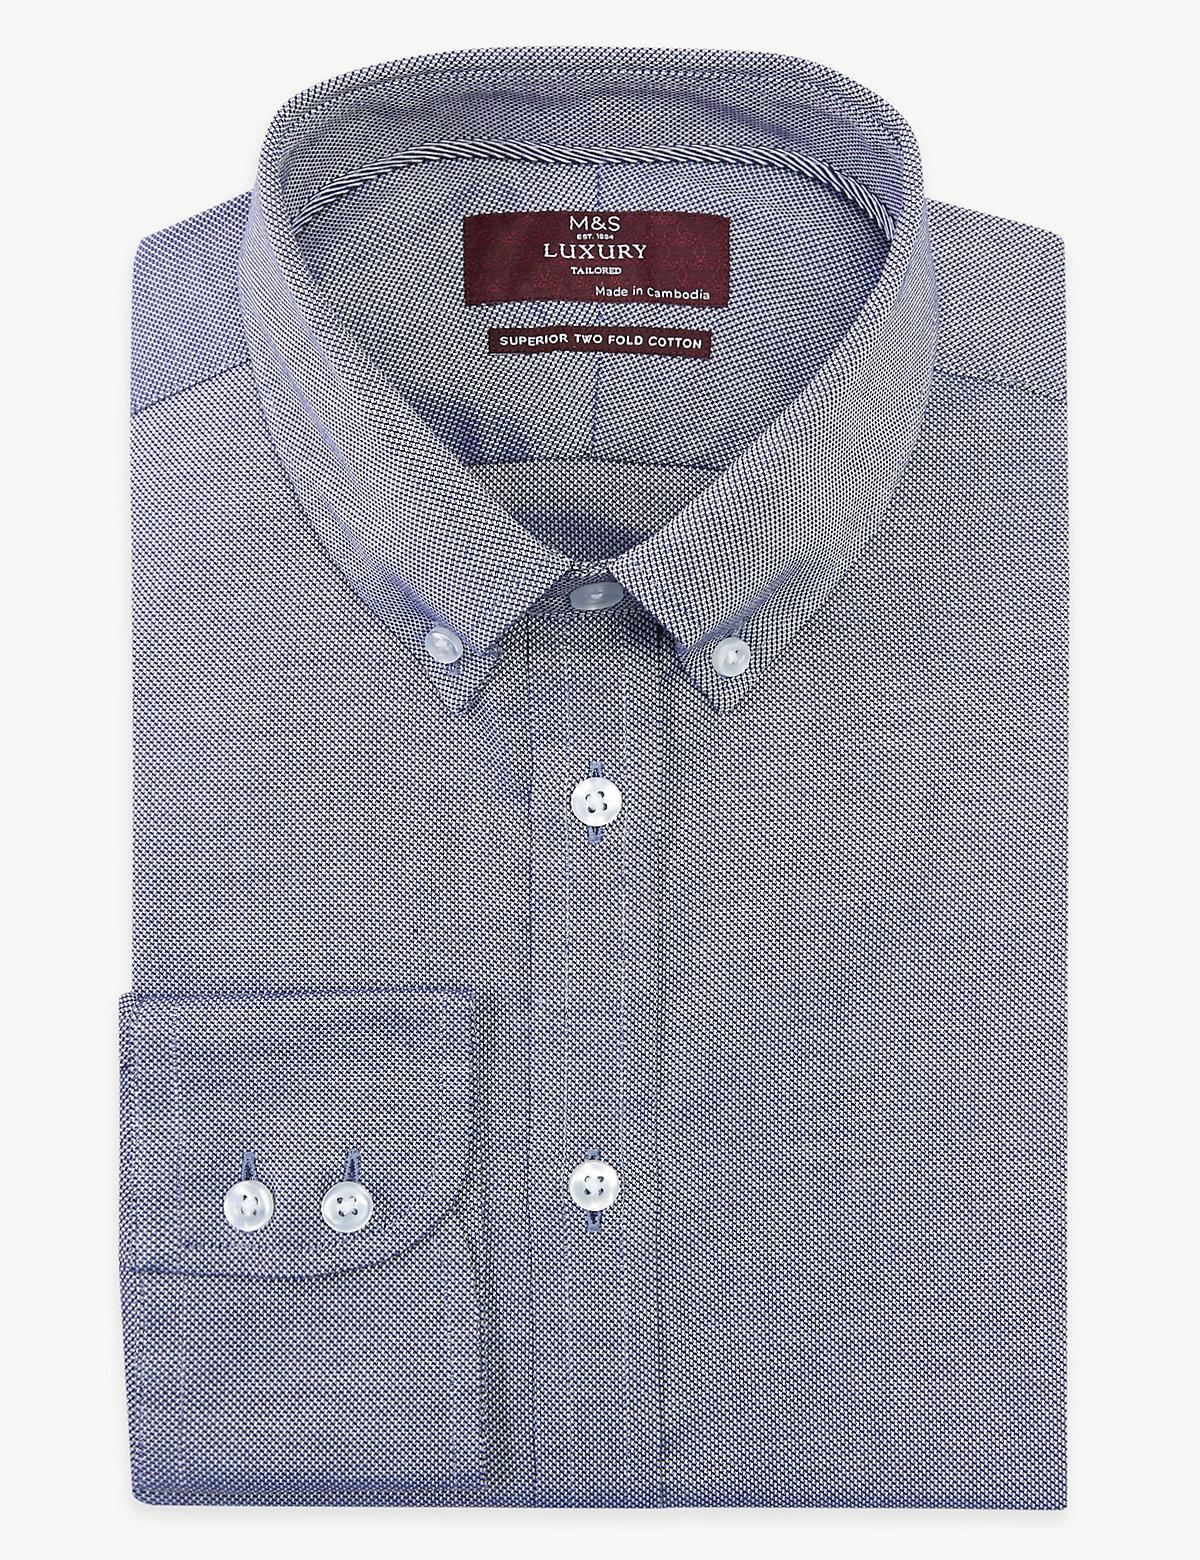 Мужская рубашка Oxford с технологией Easy to Iron